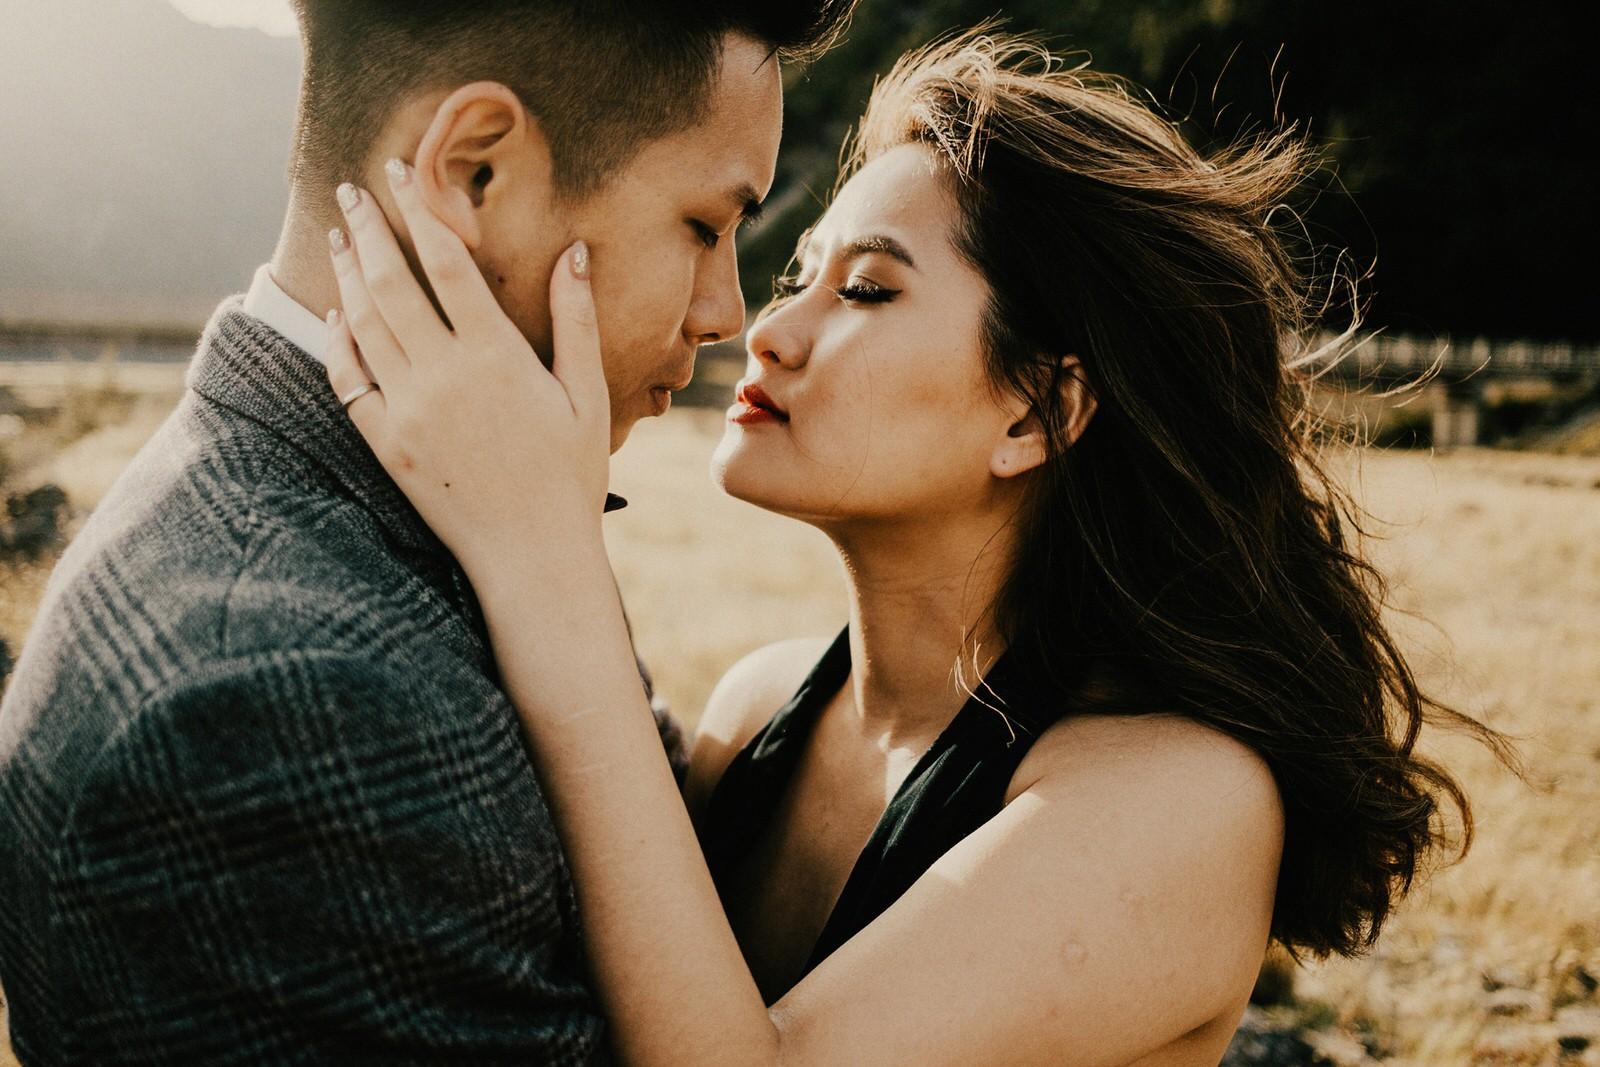 Pre-wedding photos at Mt Cook National Park, New Zealand